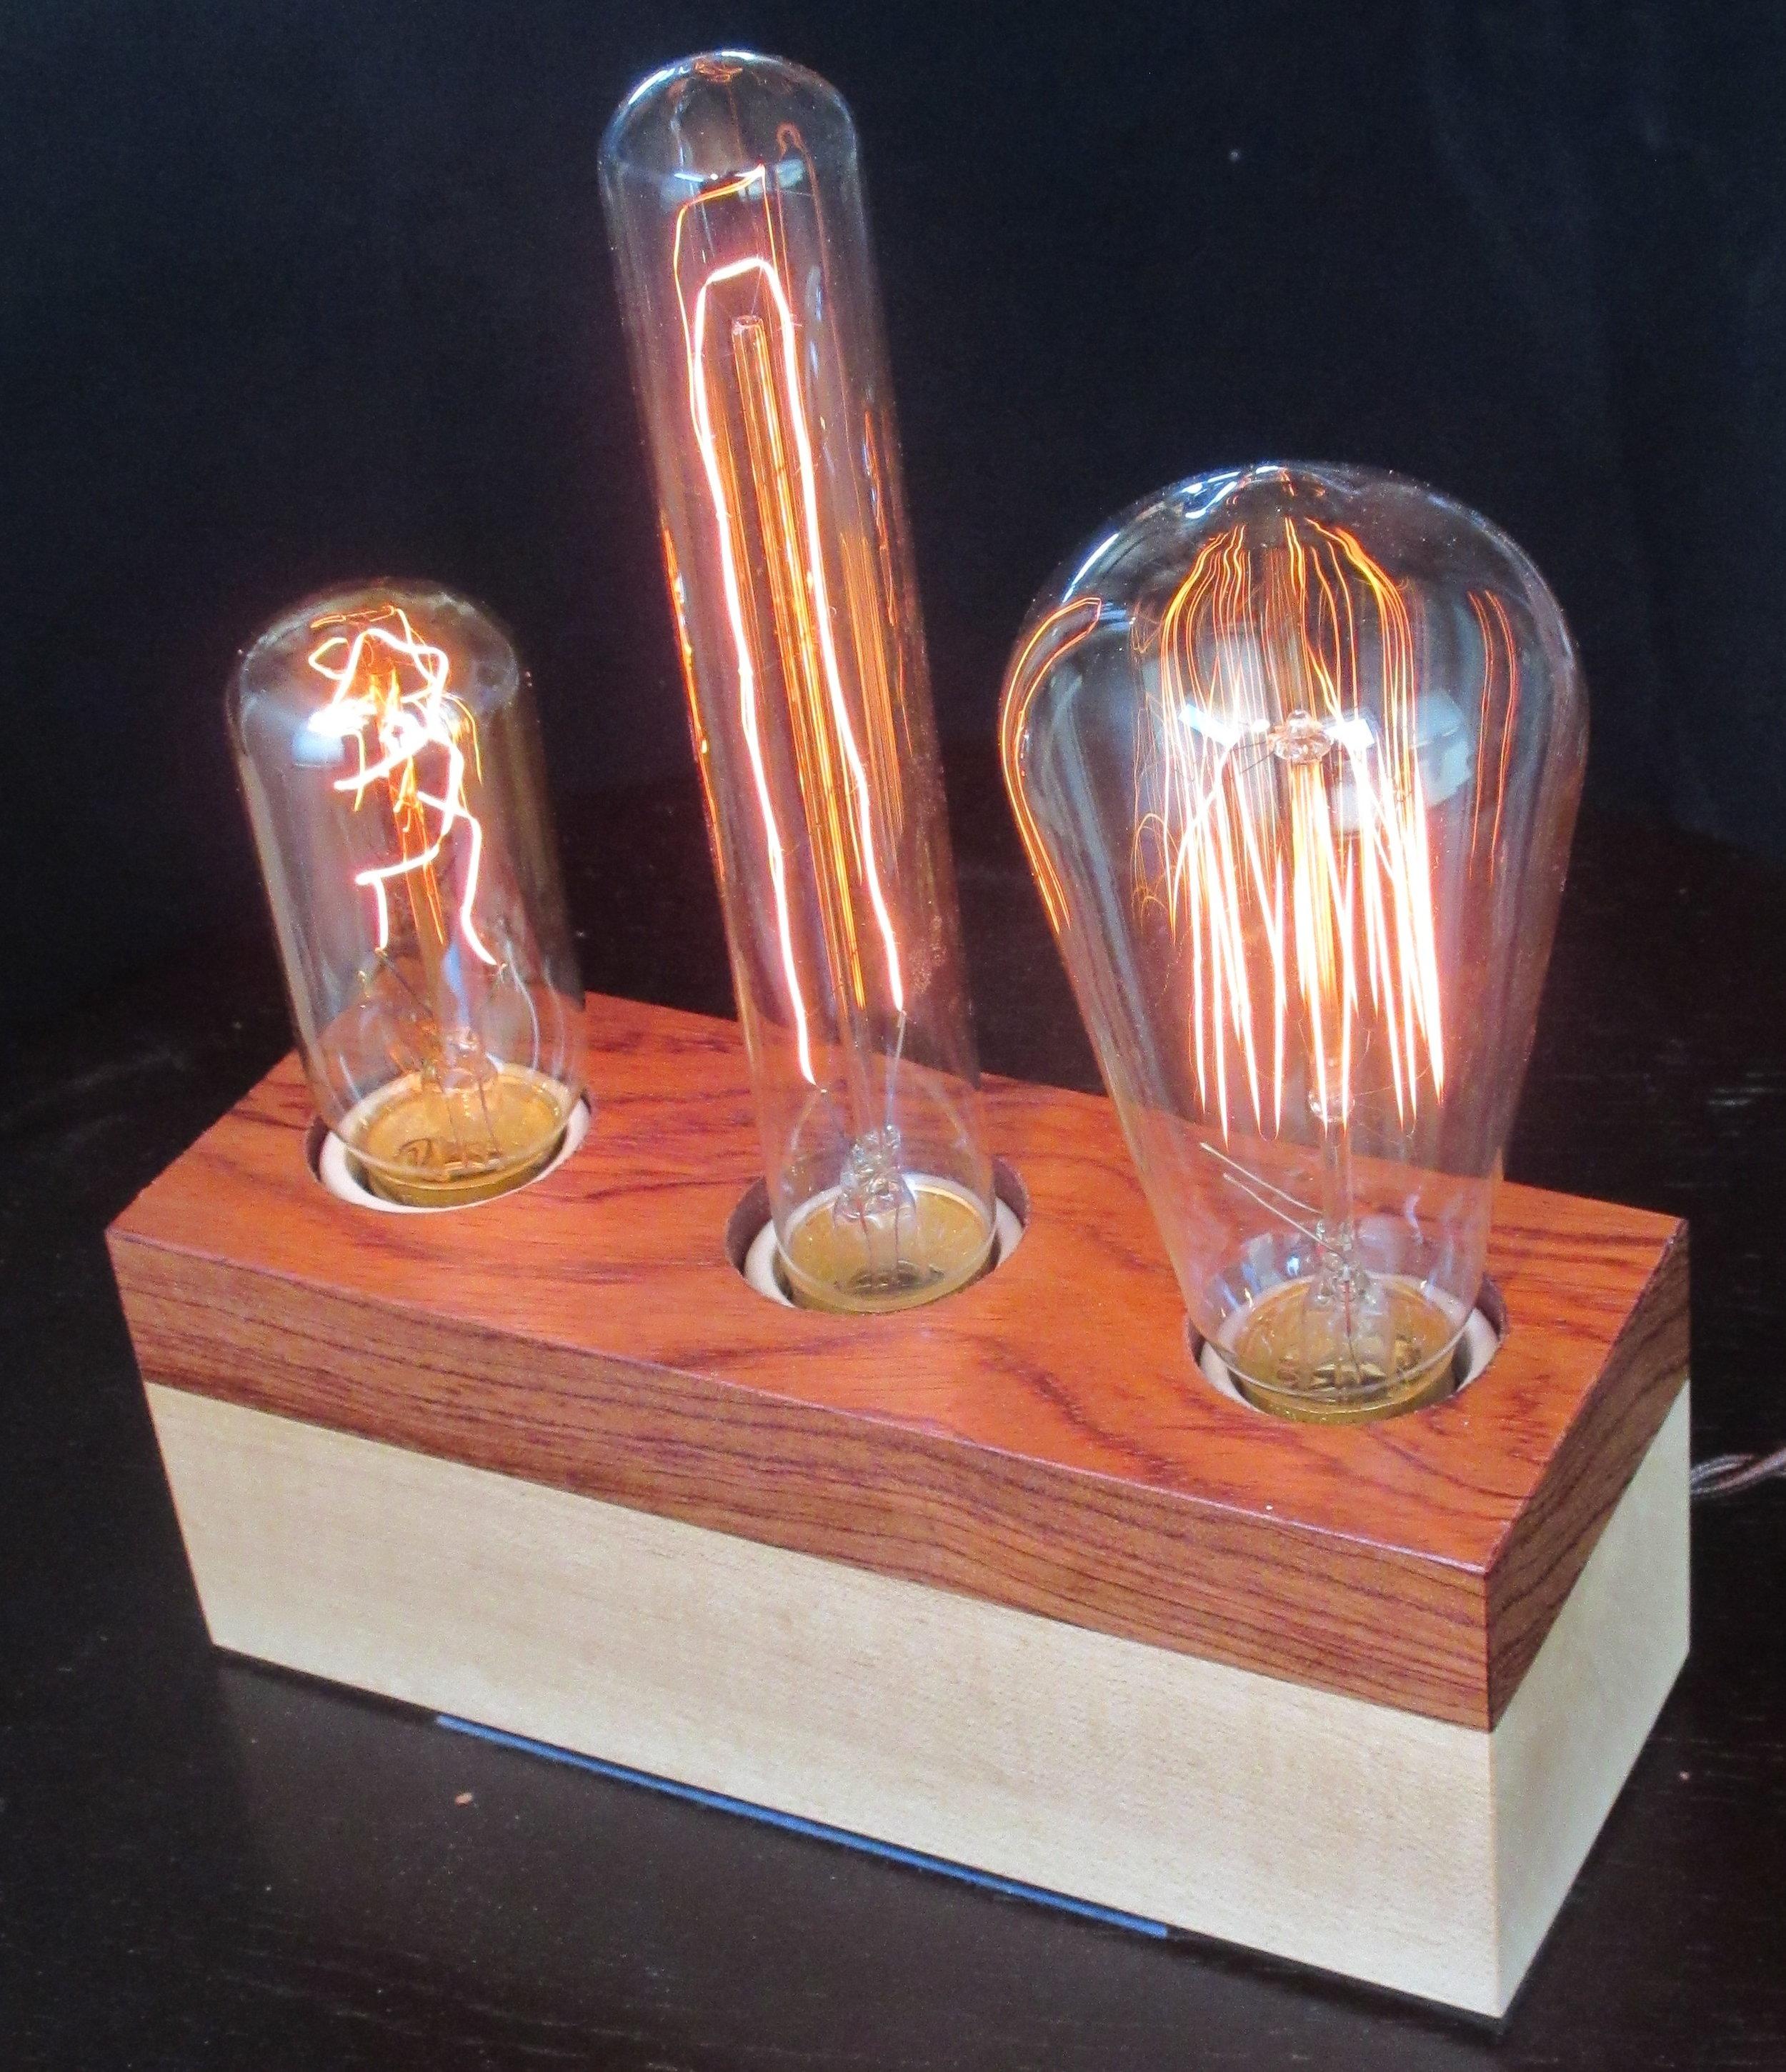 Bubinga and Maple - 3 lamps